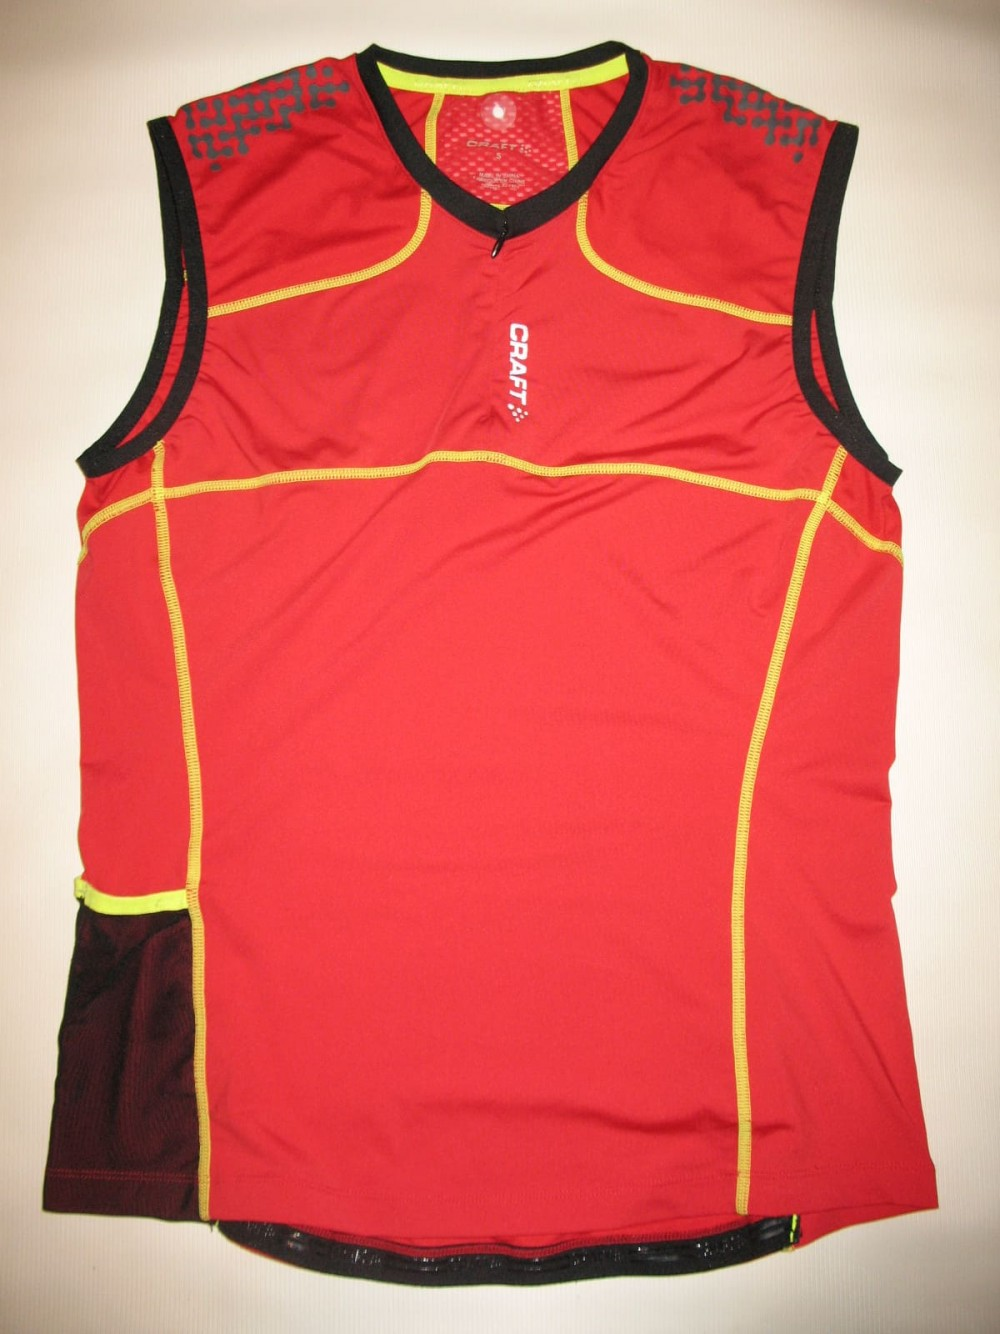 Майка CRAFT trail ss top jersey (размер S(реально M)) - 2